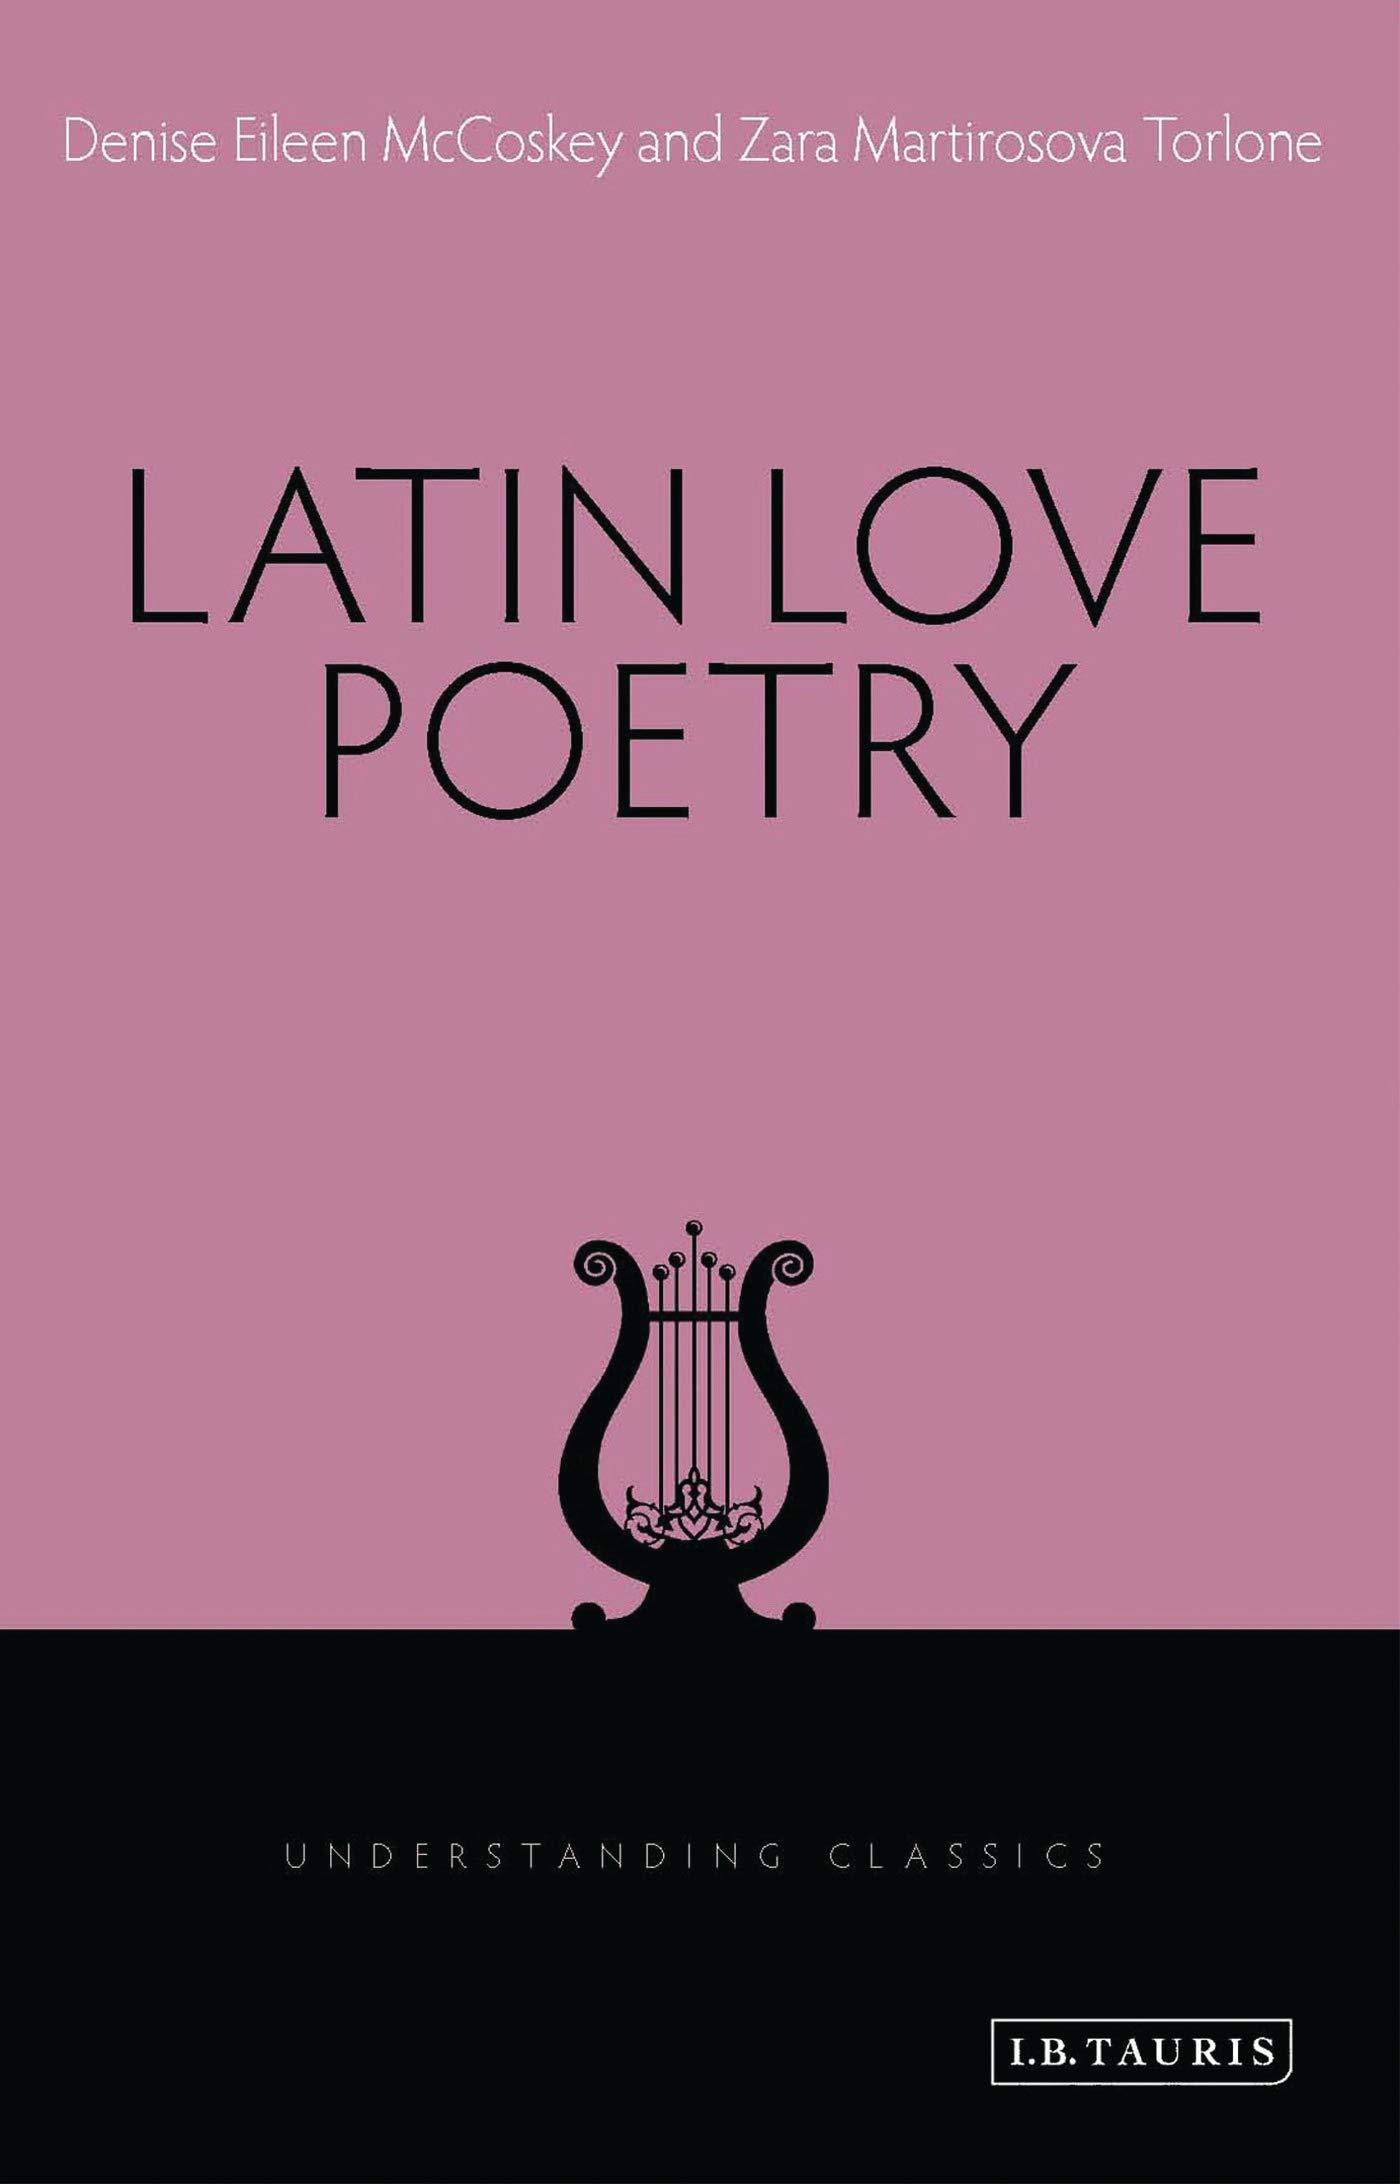 Amazon Com Latin Love Poetry Understanding Classics 9781780761916 Mccoskey Denise Eileen Torlone Zara M Stoneman Richard Books